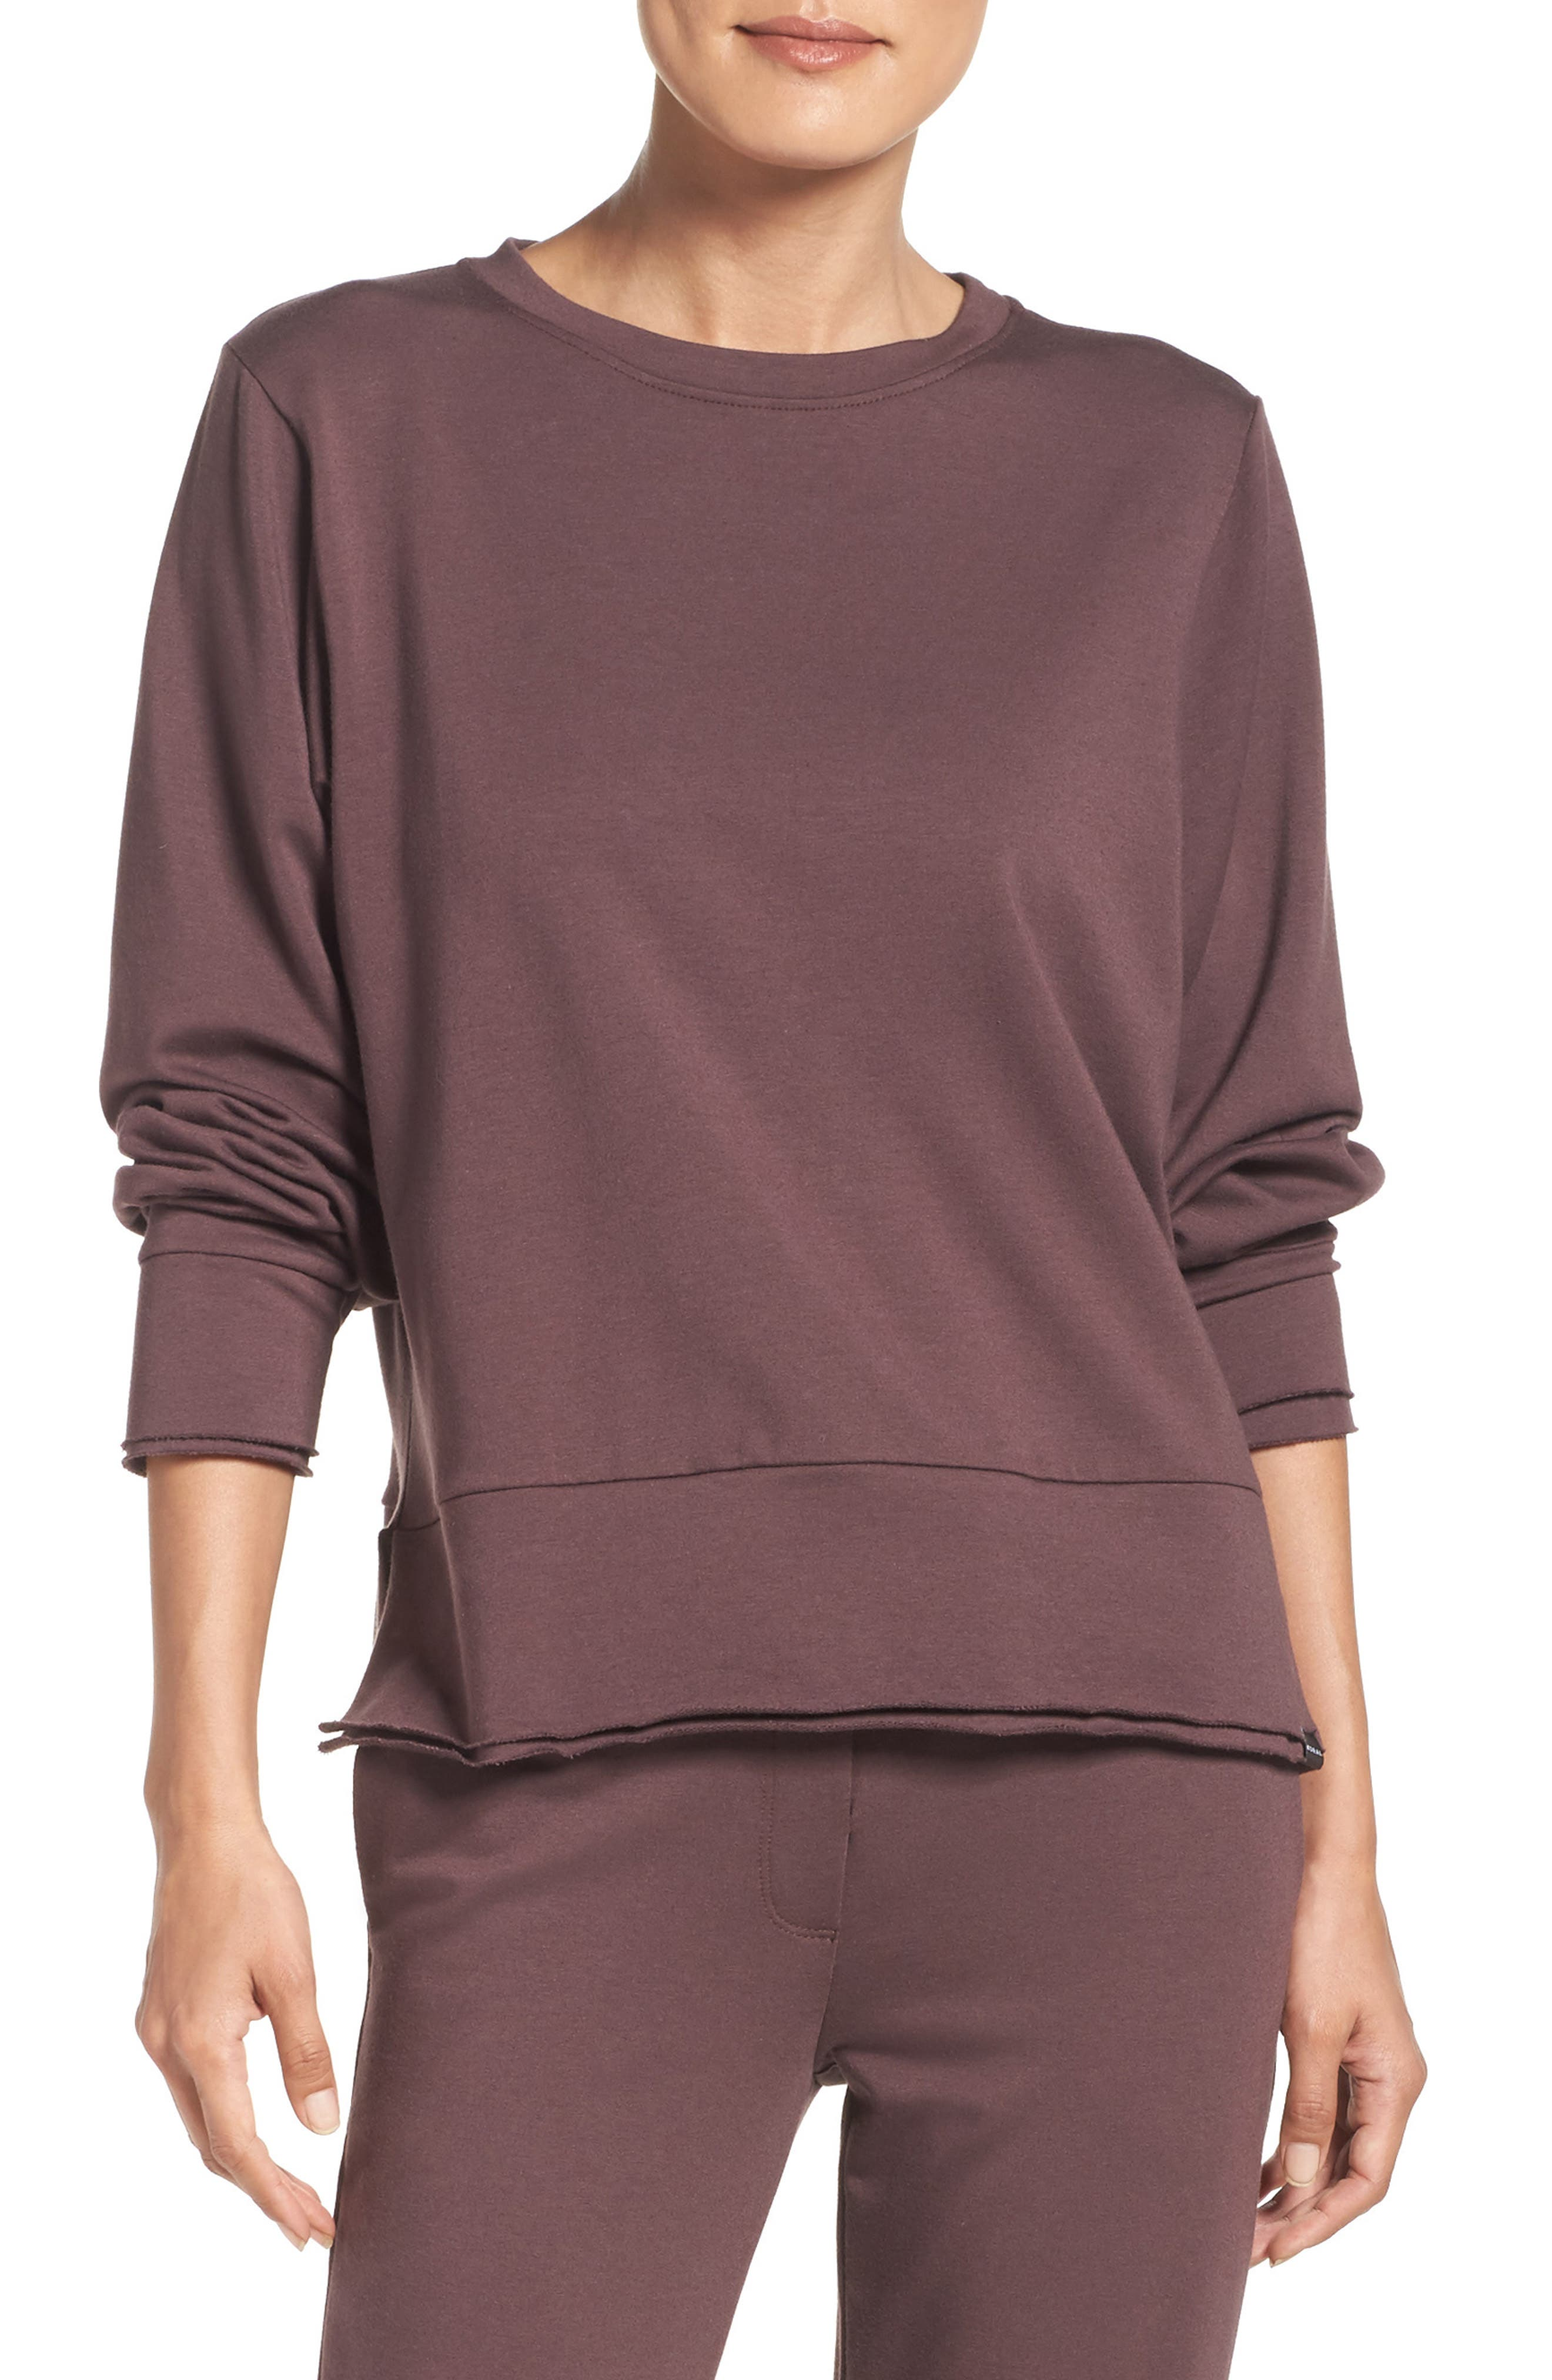 Koral Global Sweatshirt